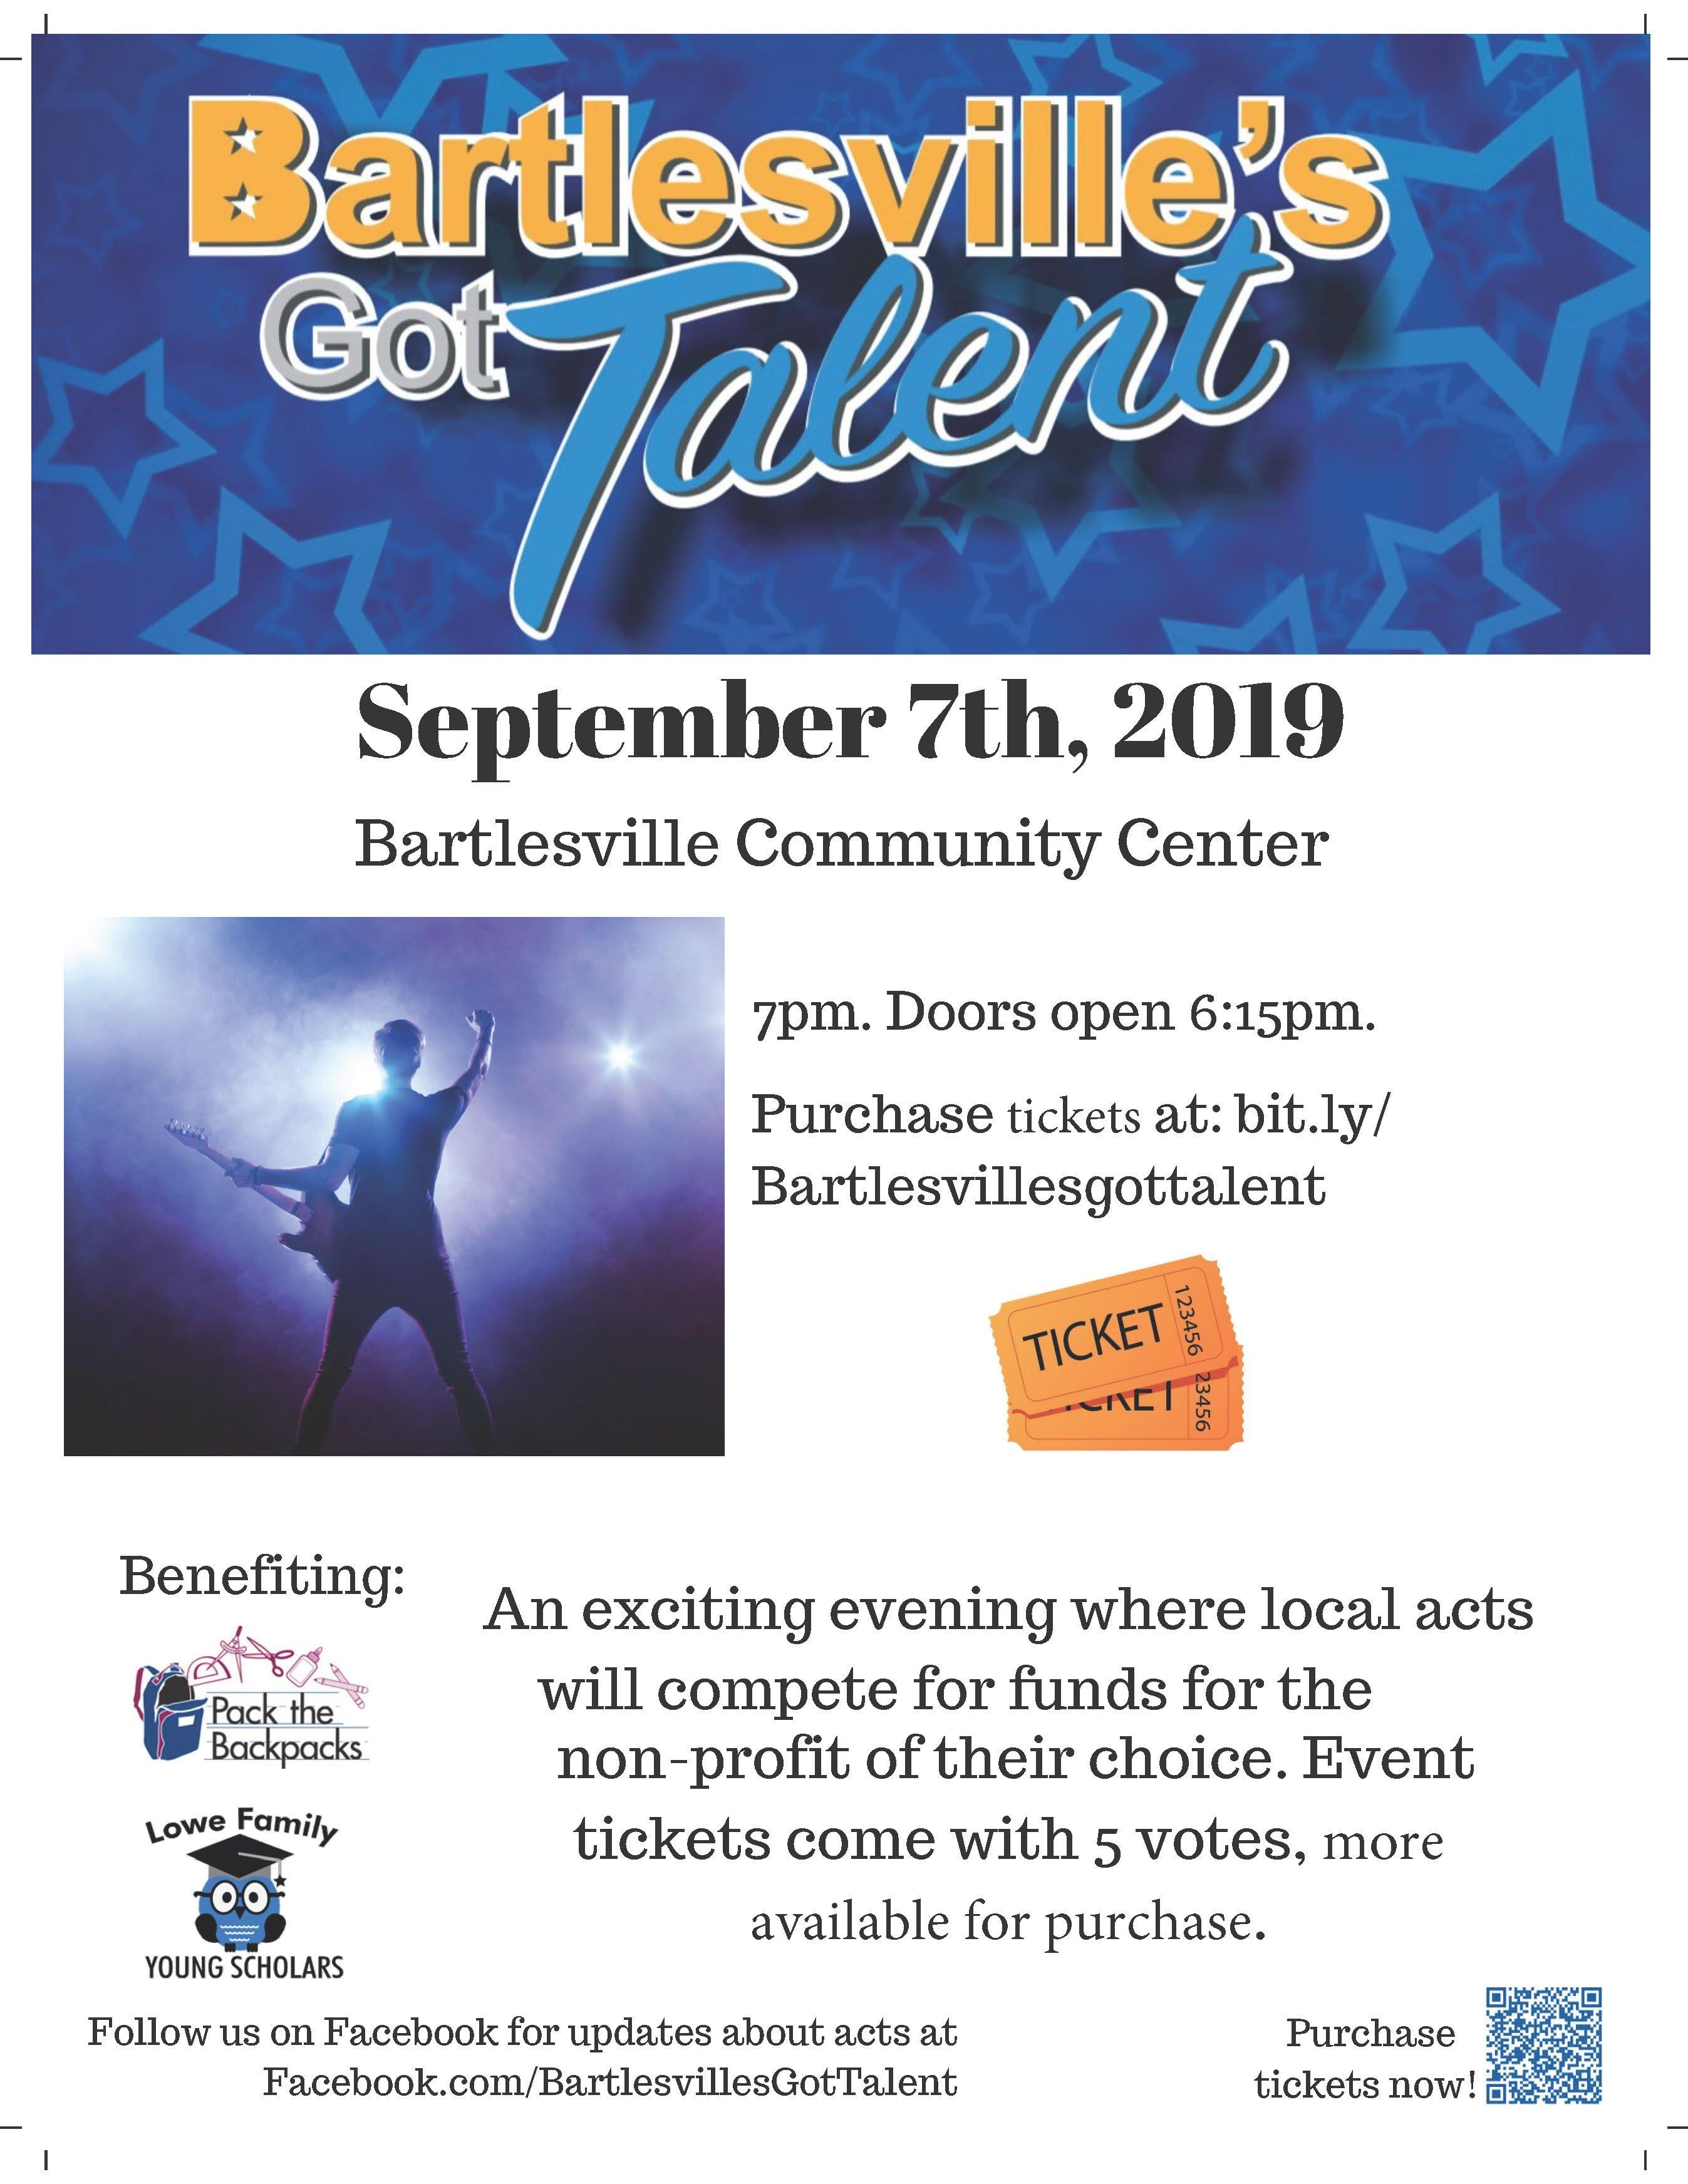 Bartlesville's Got Talent